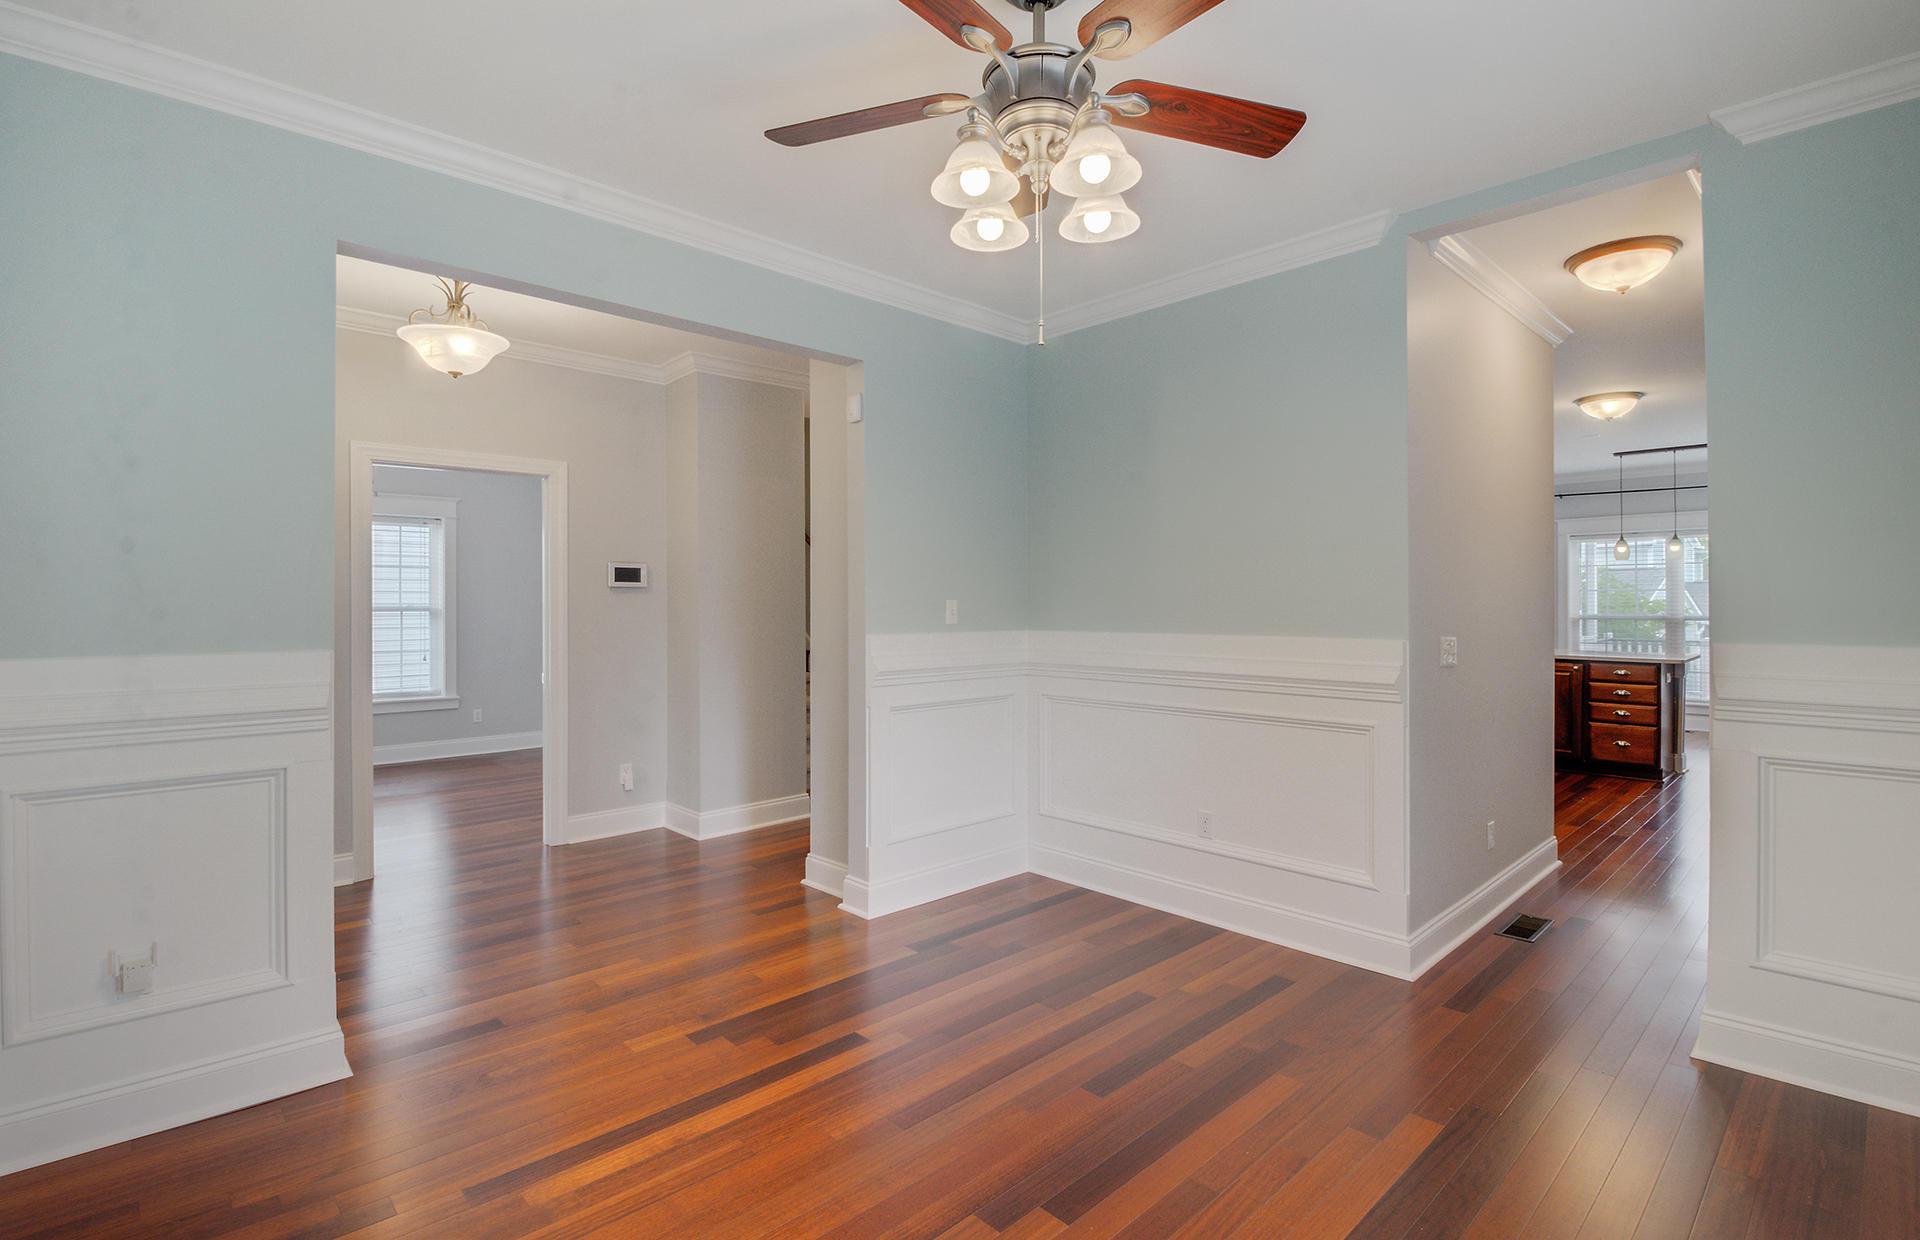 Daniel Island Homes For Sale - 306 Ladd, Charleston, SC - 7